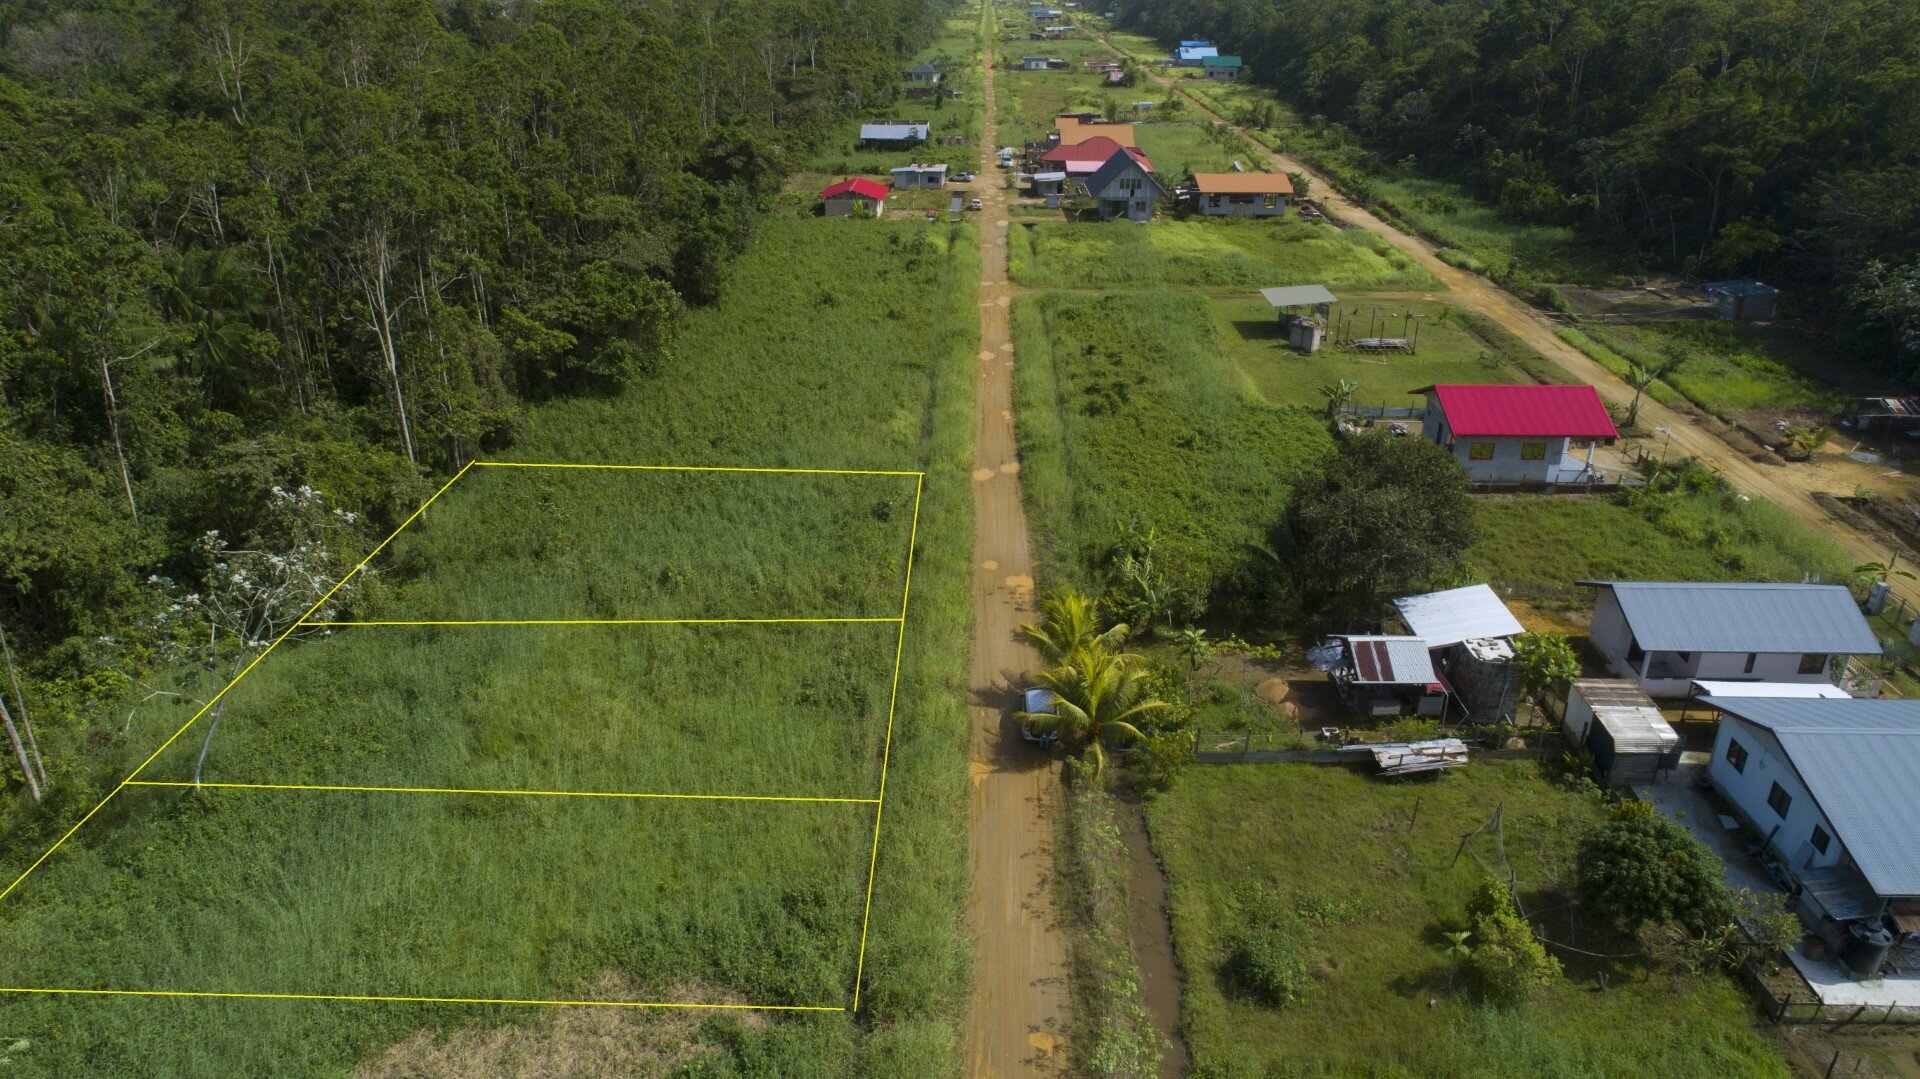 Isabellaproject 583 - Landelijk gelegen eigendomskavels te Saramacca - Surgoed Makelaardij NV - Paramaribo, Suriname